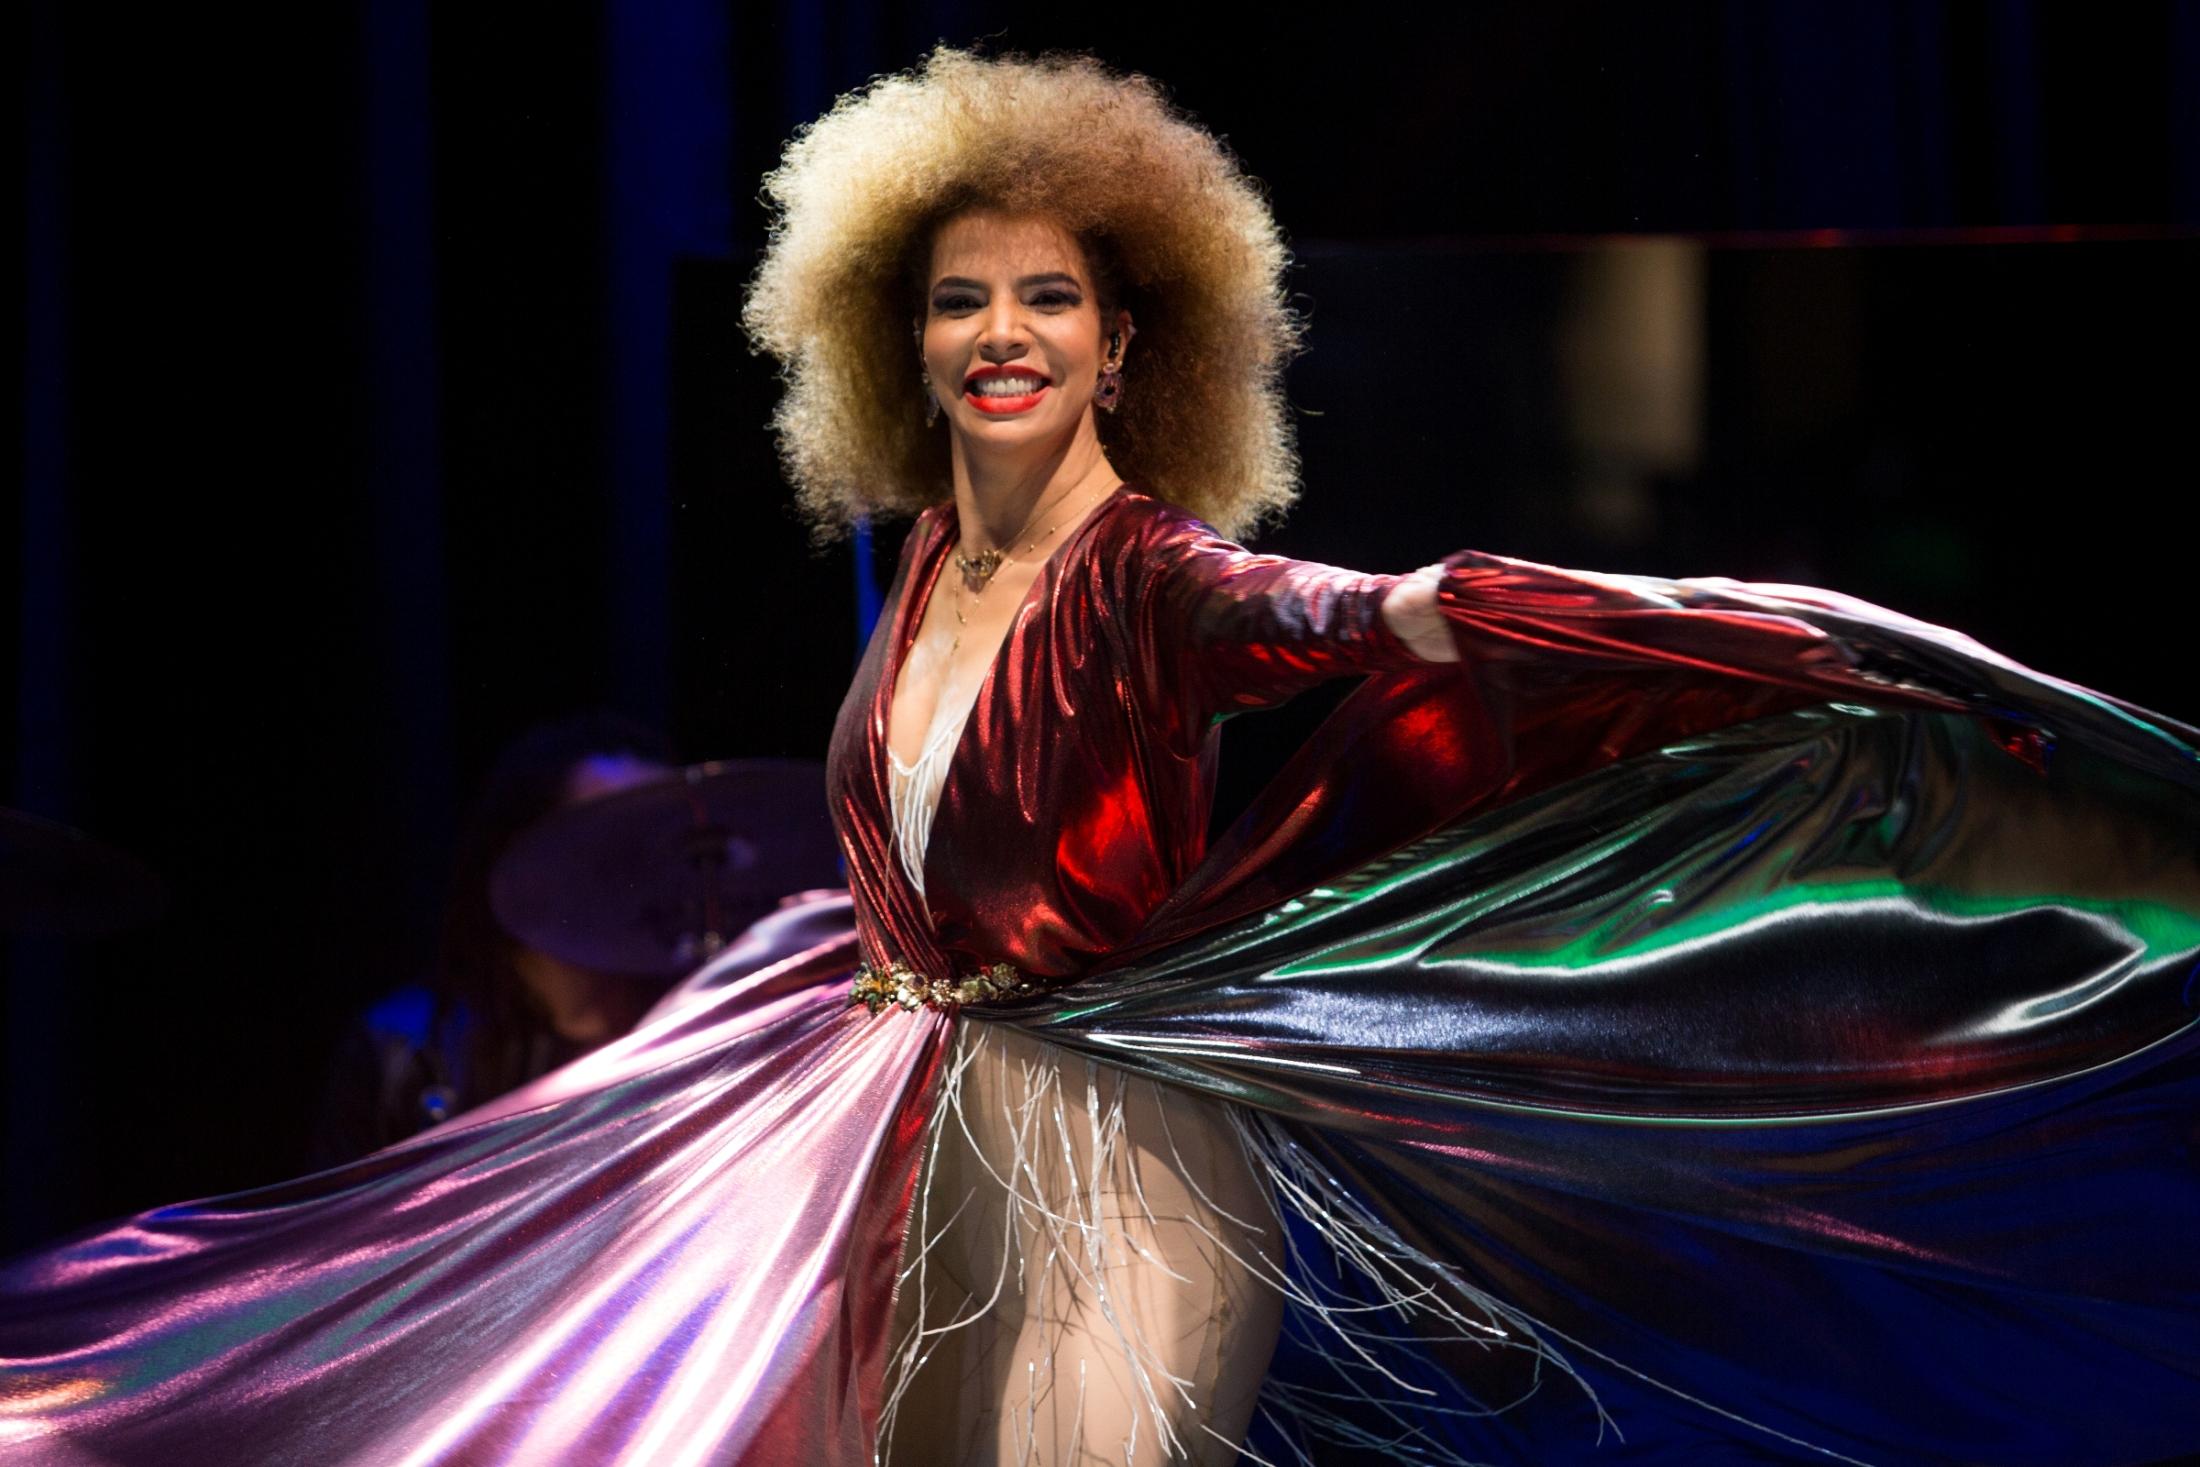 Vanessa da Mata traz Caixinha de Música a Curitiba